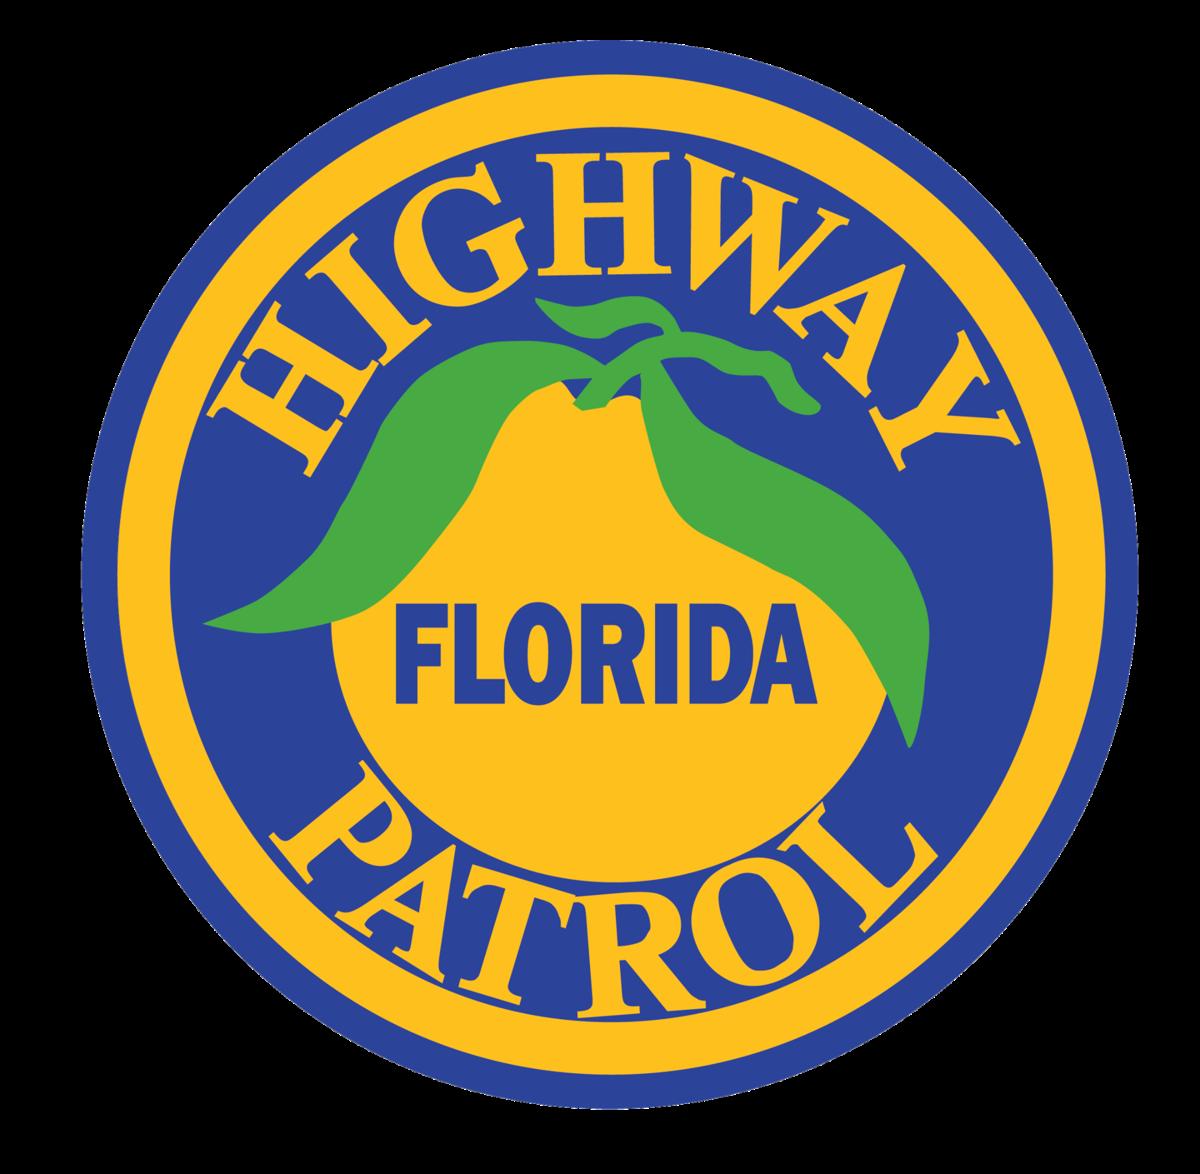 Florida Highway Patrol Traffic >> Florida Highway Patrol Wikipedia